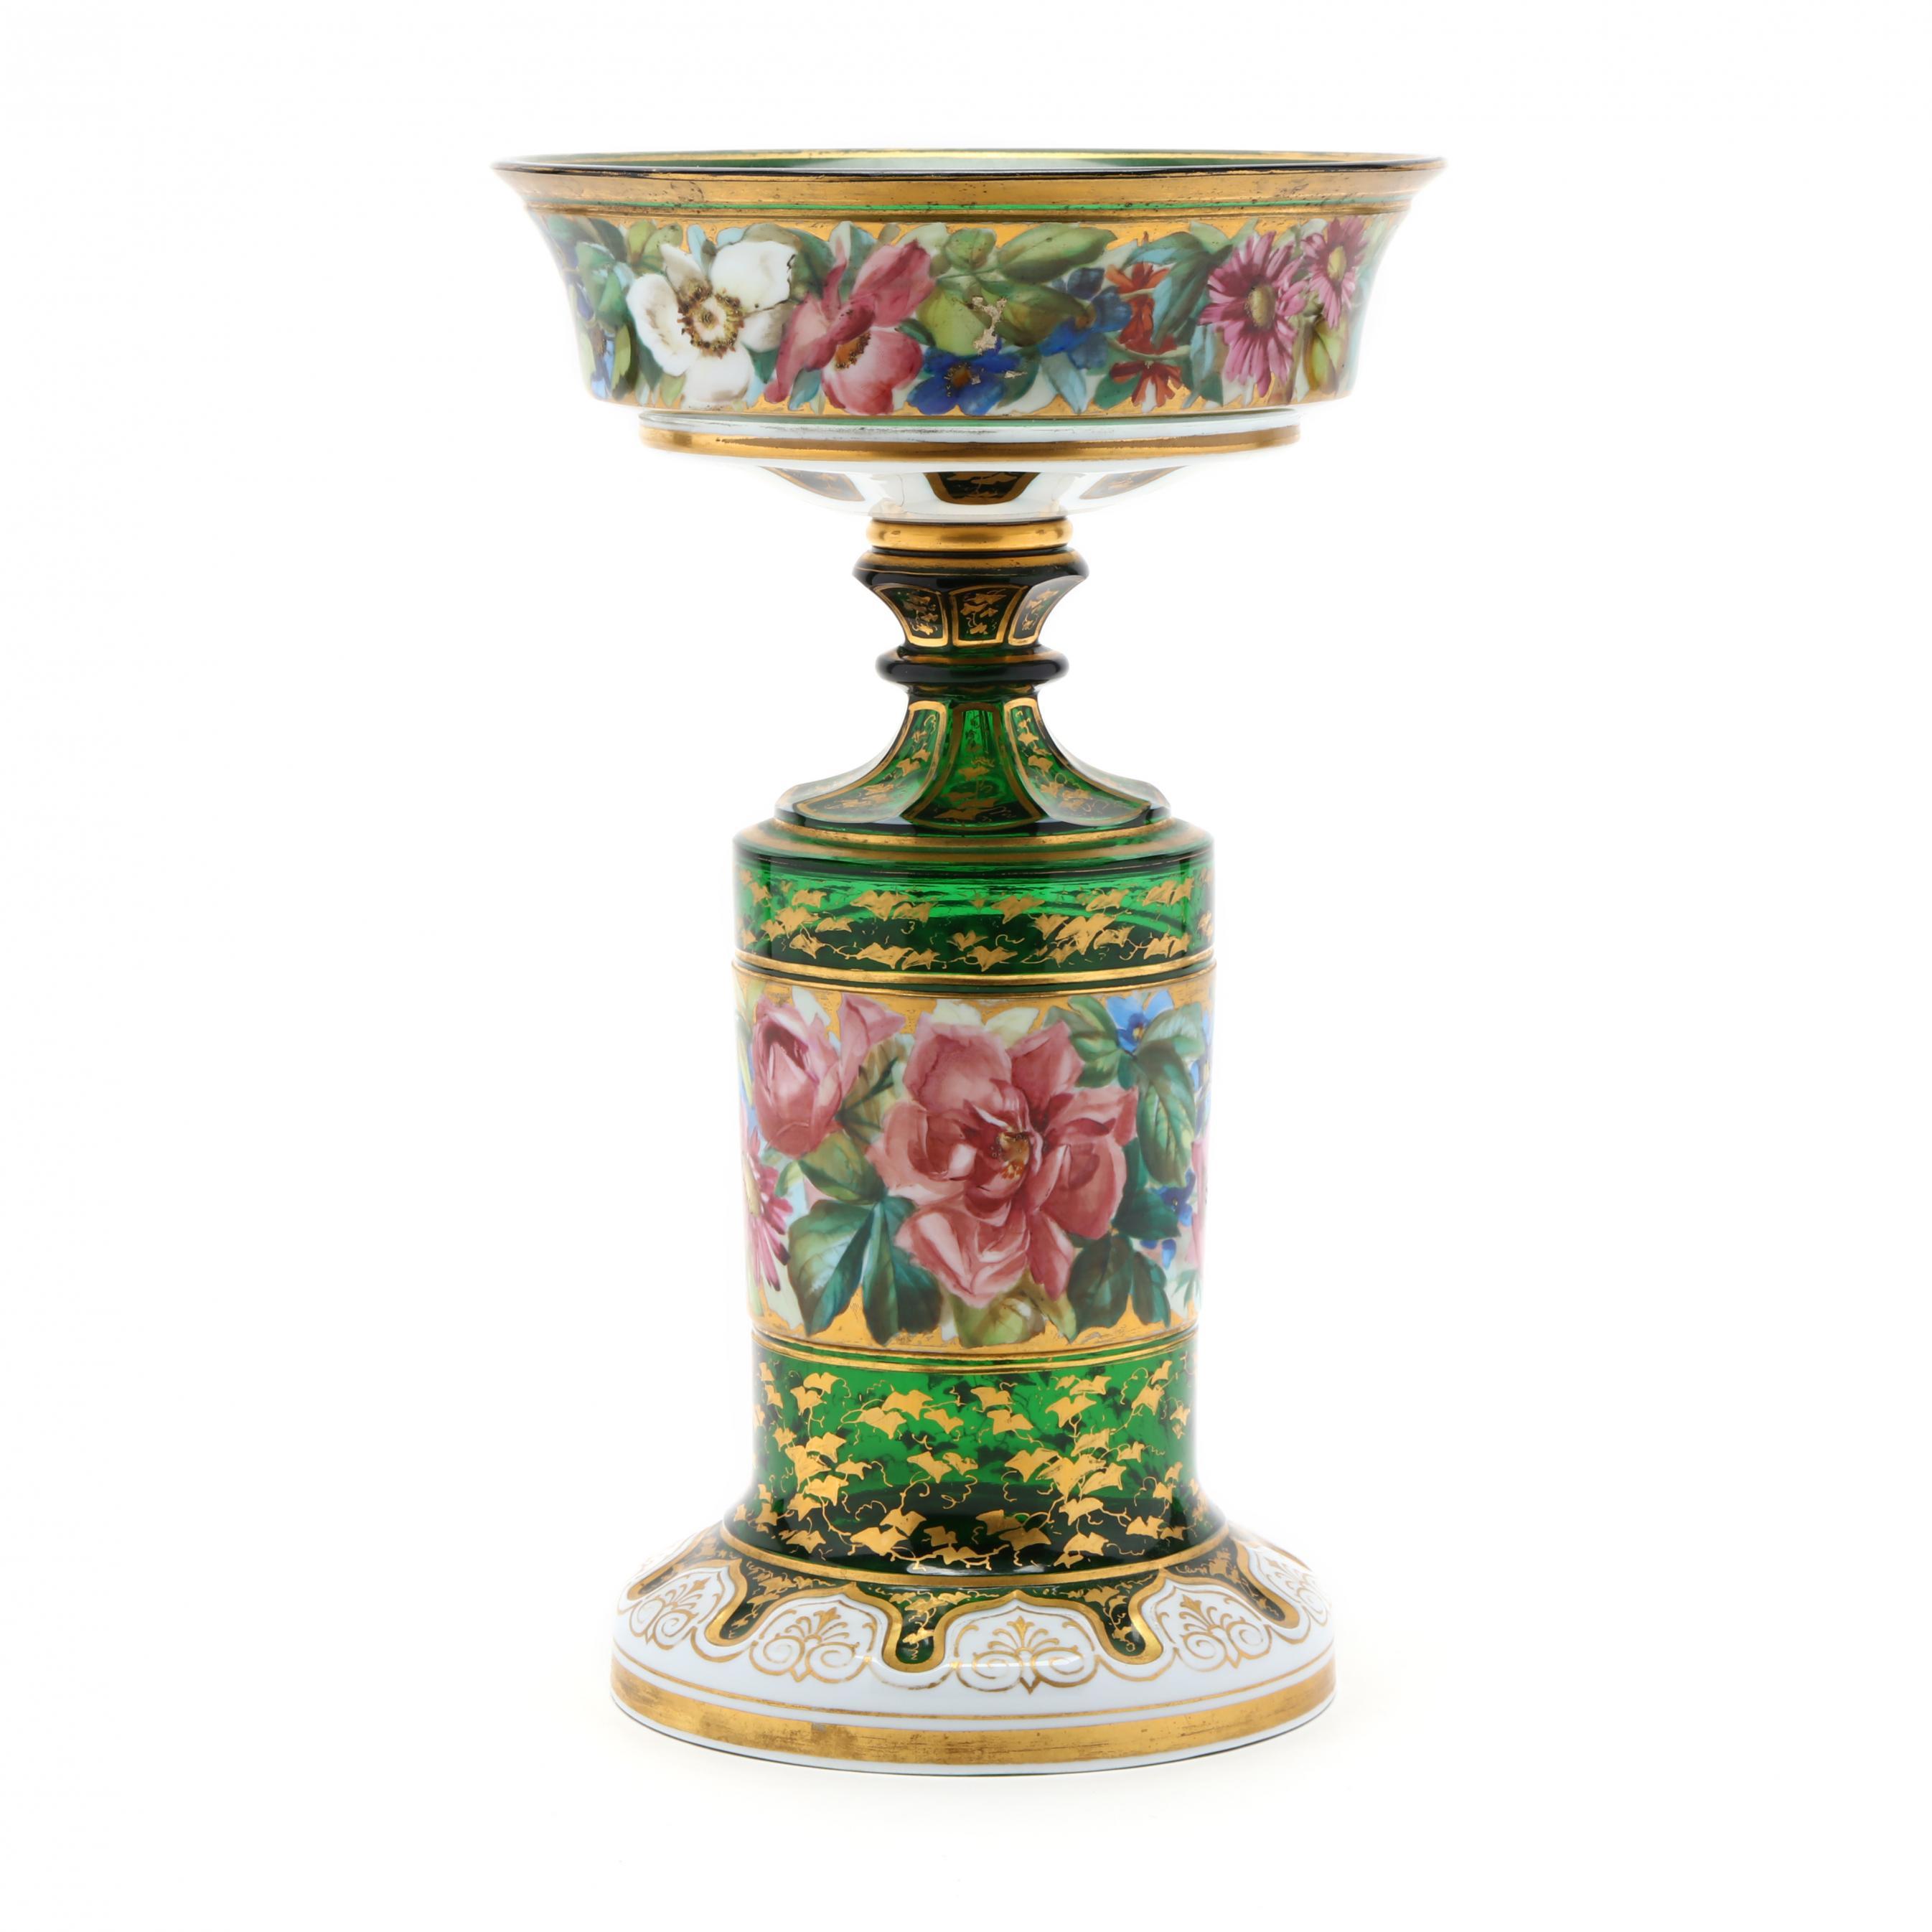 att-moser-enamel-decorated-glass-centerpiece